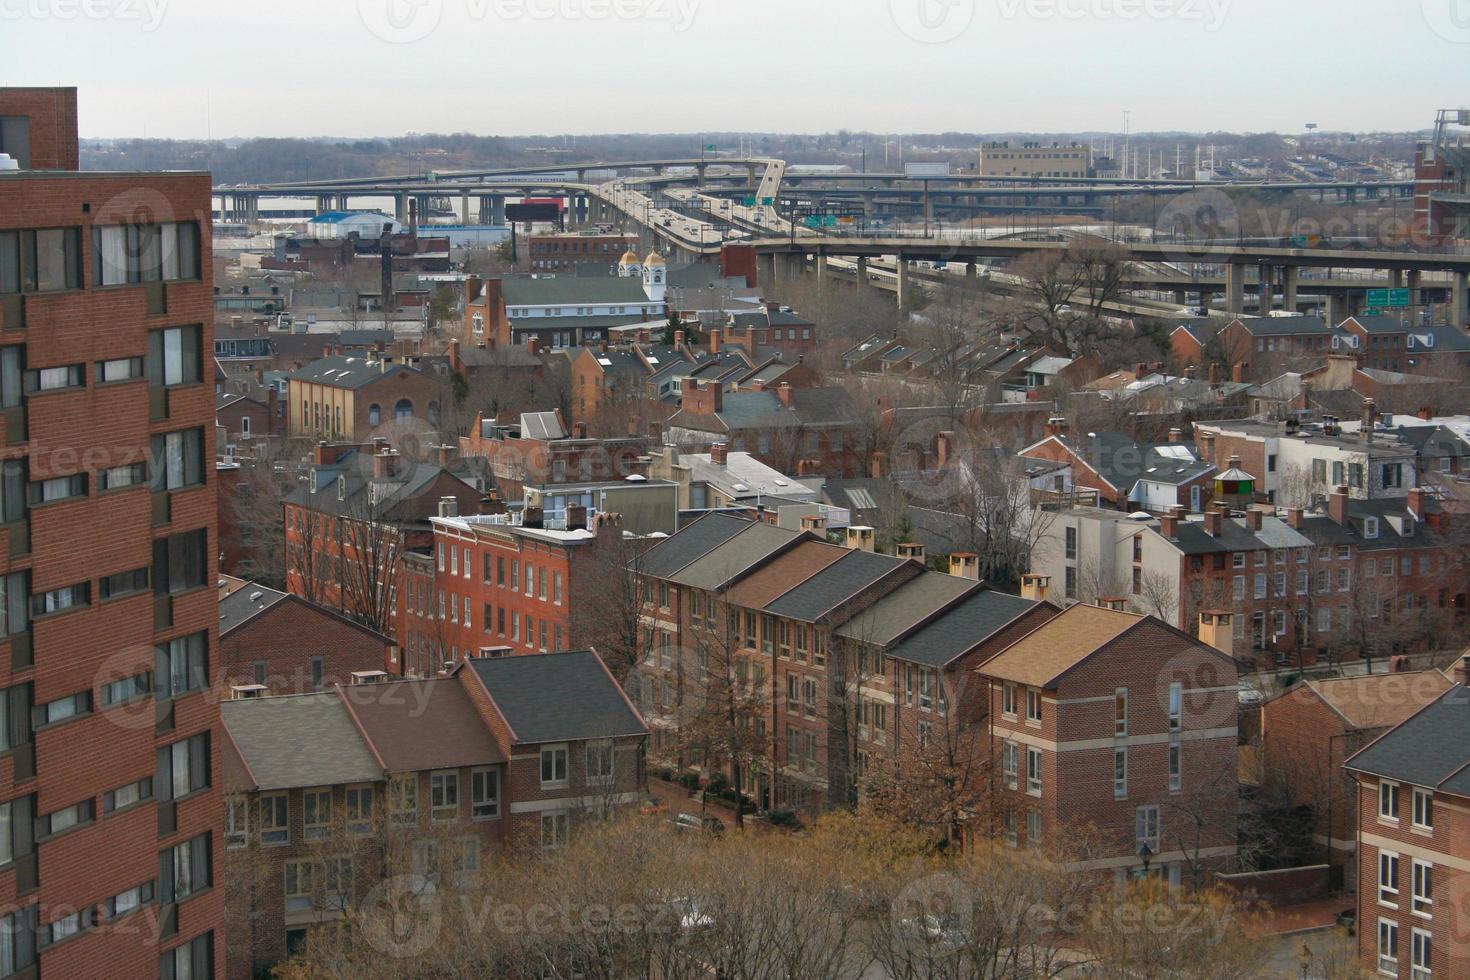 Neighborhood aerial view 3 photo